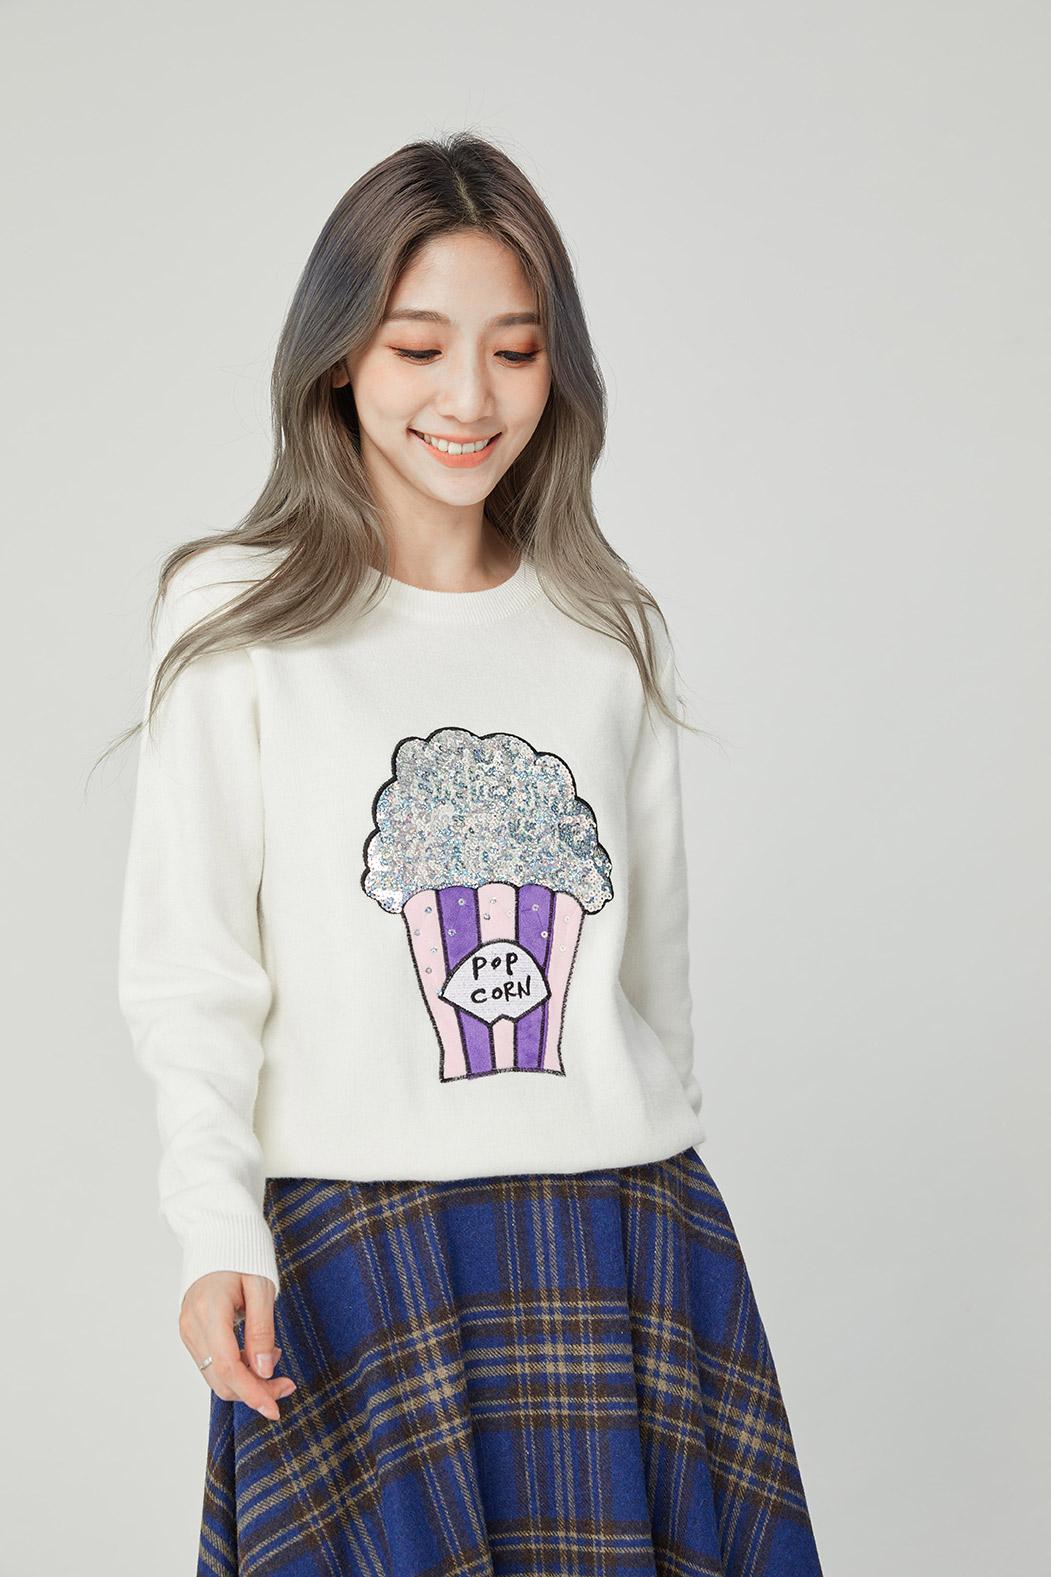 CKN181250 亮片爆米花圖案羊毛針織上衣/二色